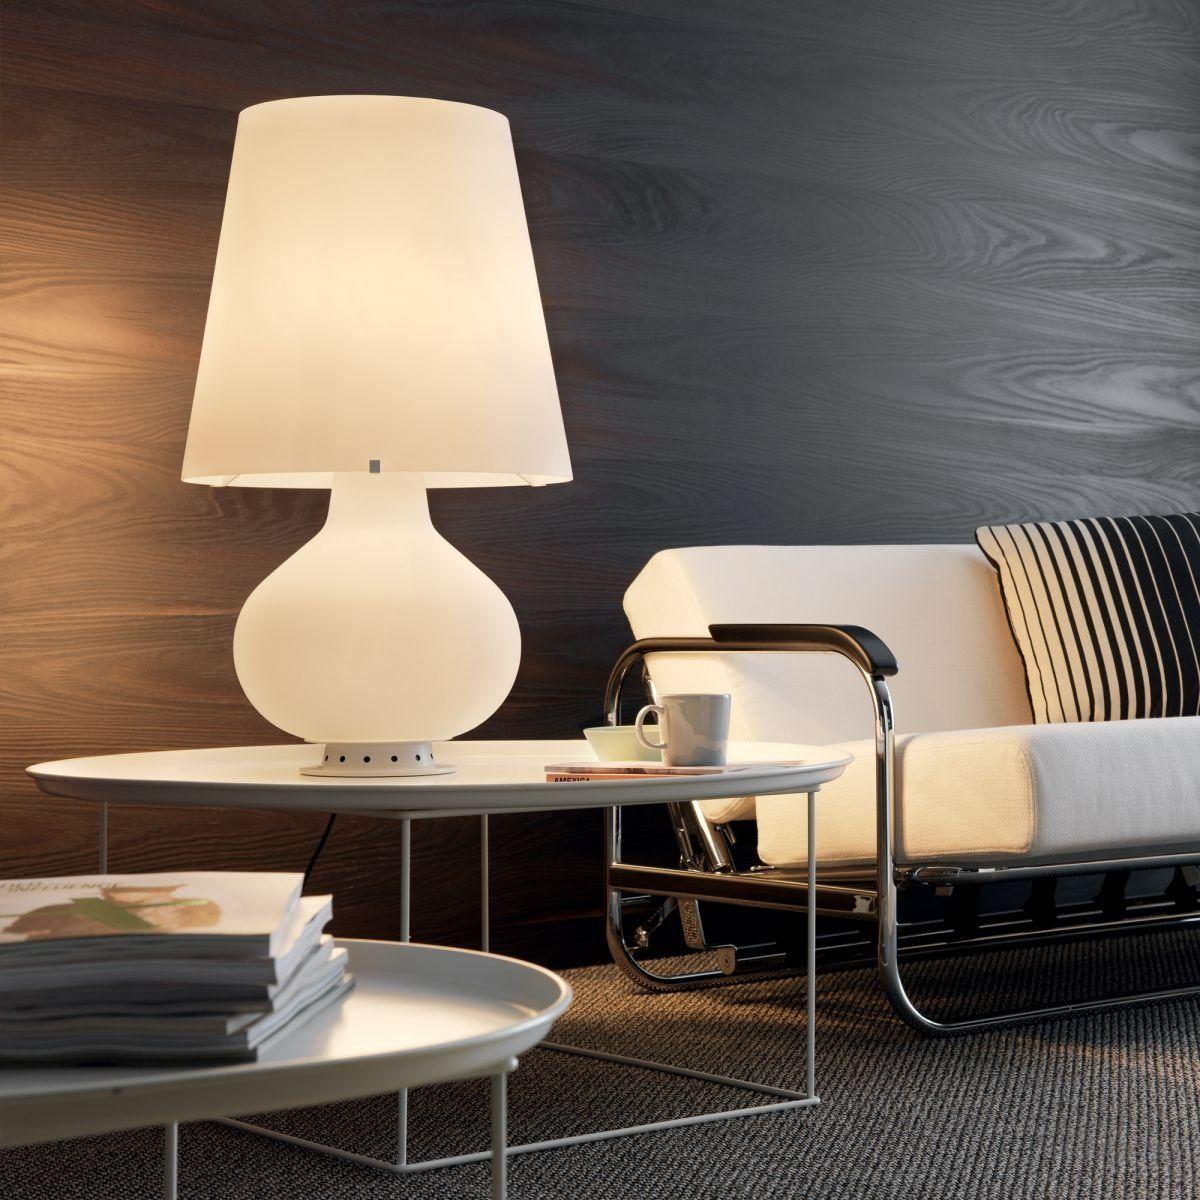 Fontana Table Lamp In 2020 White Table Lamp Table Lamp Lamp